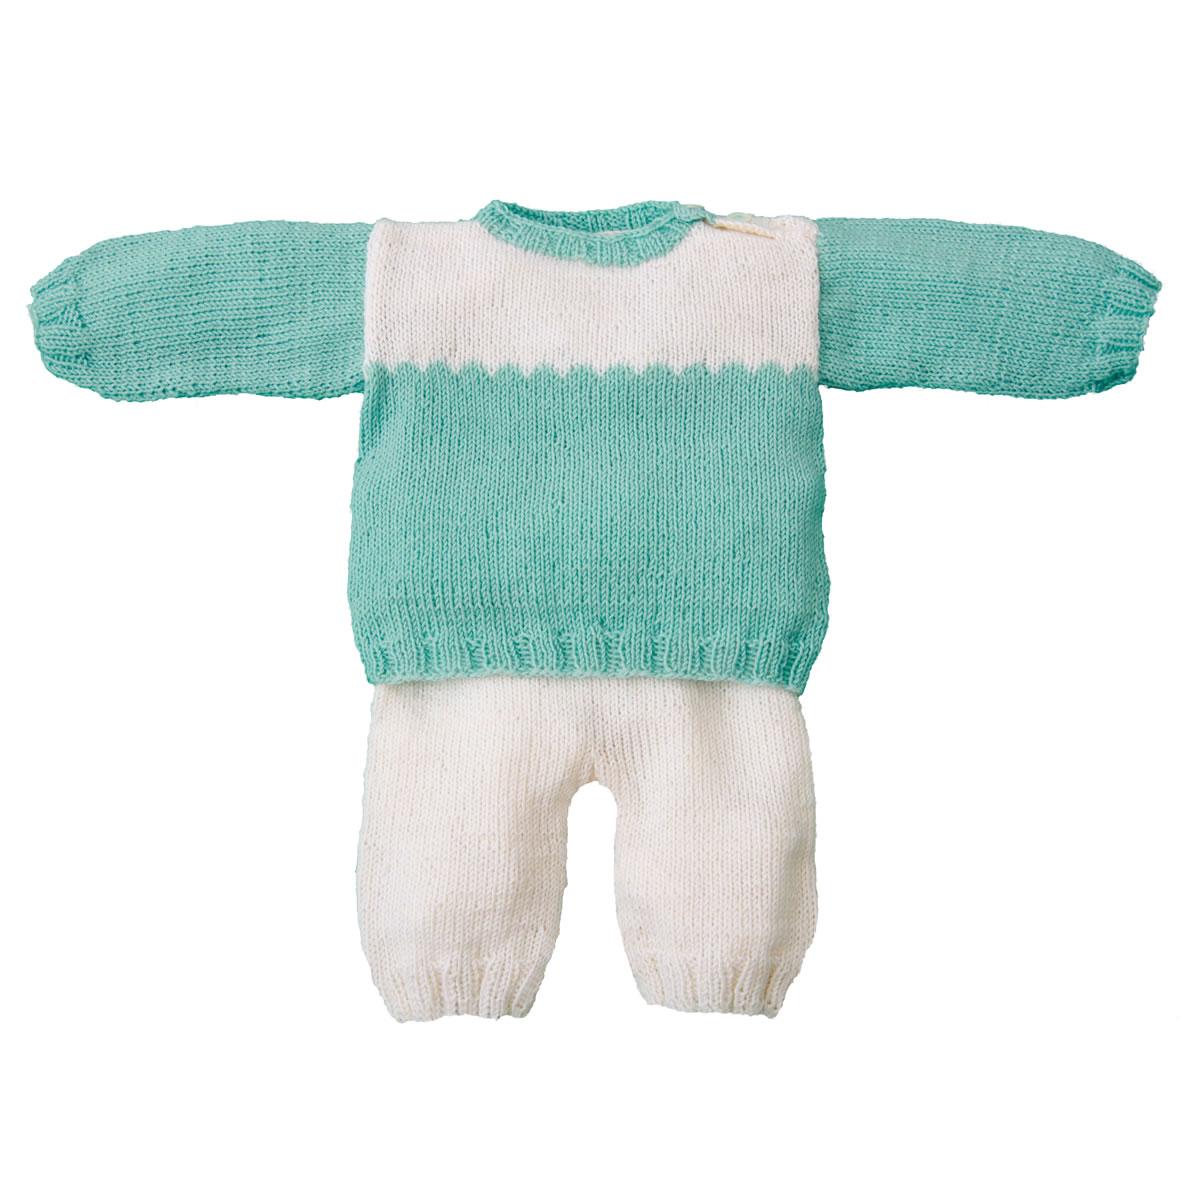 Lana Grossa Pulli Hose Cool Wool Baby Filati Infanti No 9